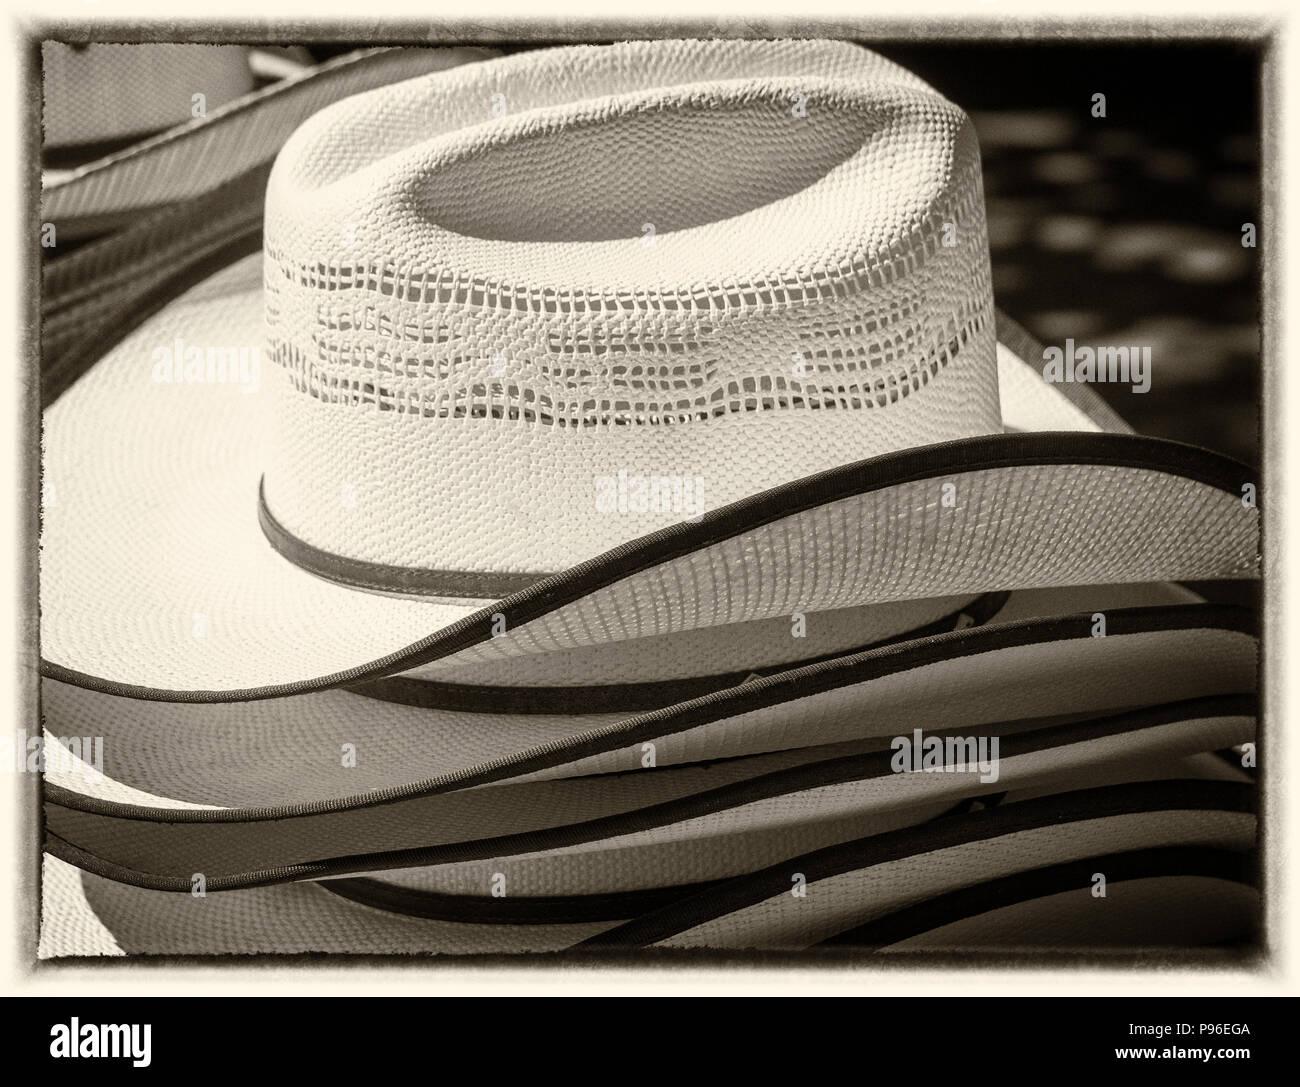 Cowboy Fashion Imágenes De Stock   Cowboy Fashion Fotos De Stock - Alamy 8c582e70b099